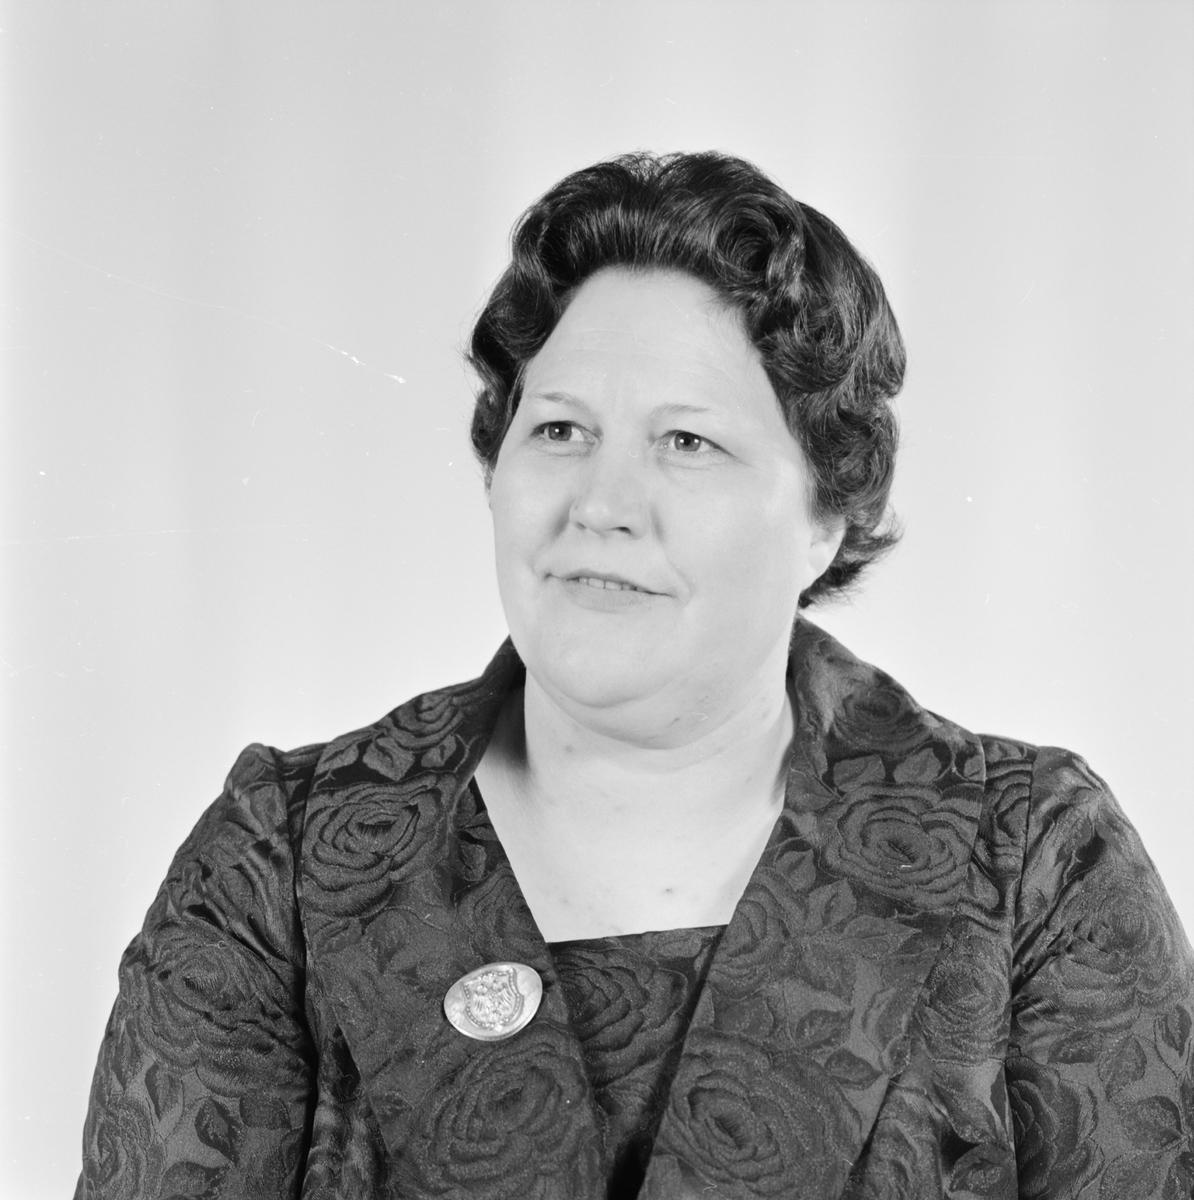 Elisabeth Wiborgh, Uppsala, maj 1962